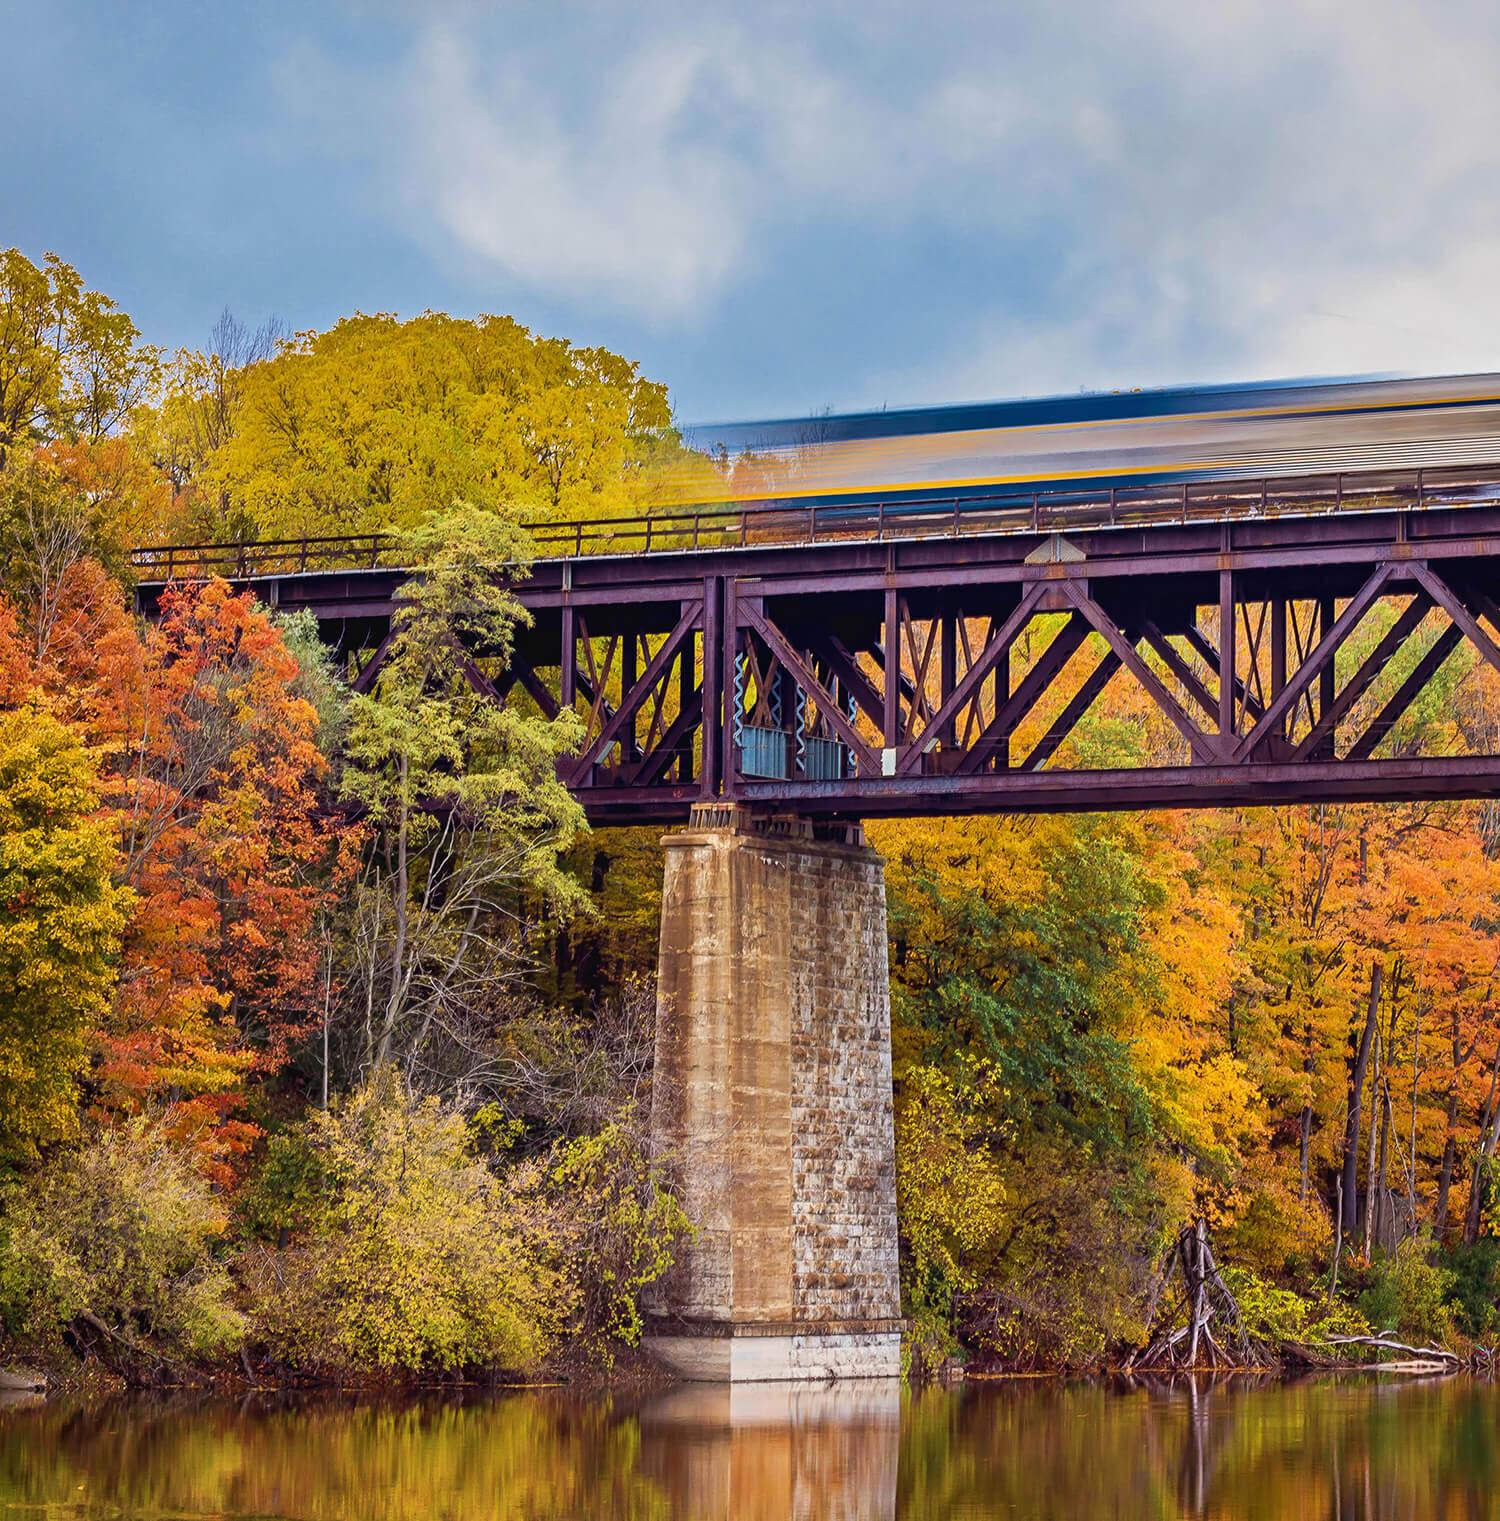 Railroad going over Grand River in Paris, Ontario